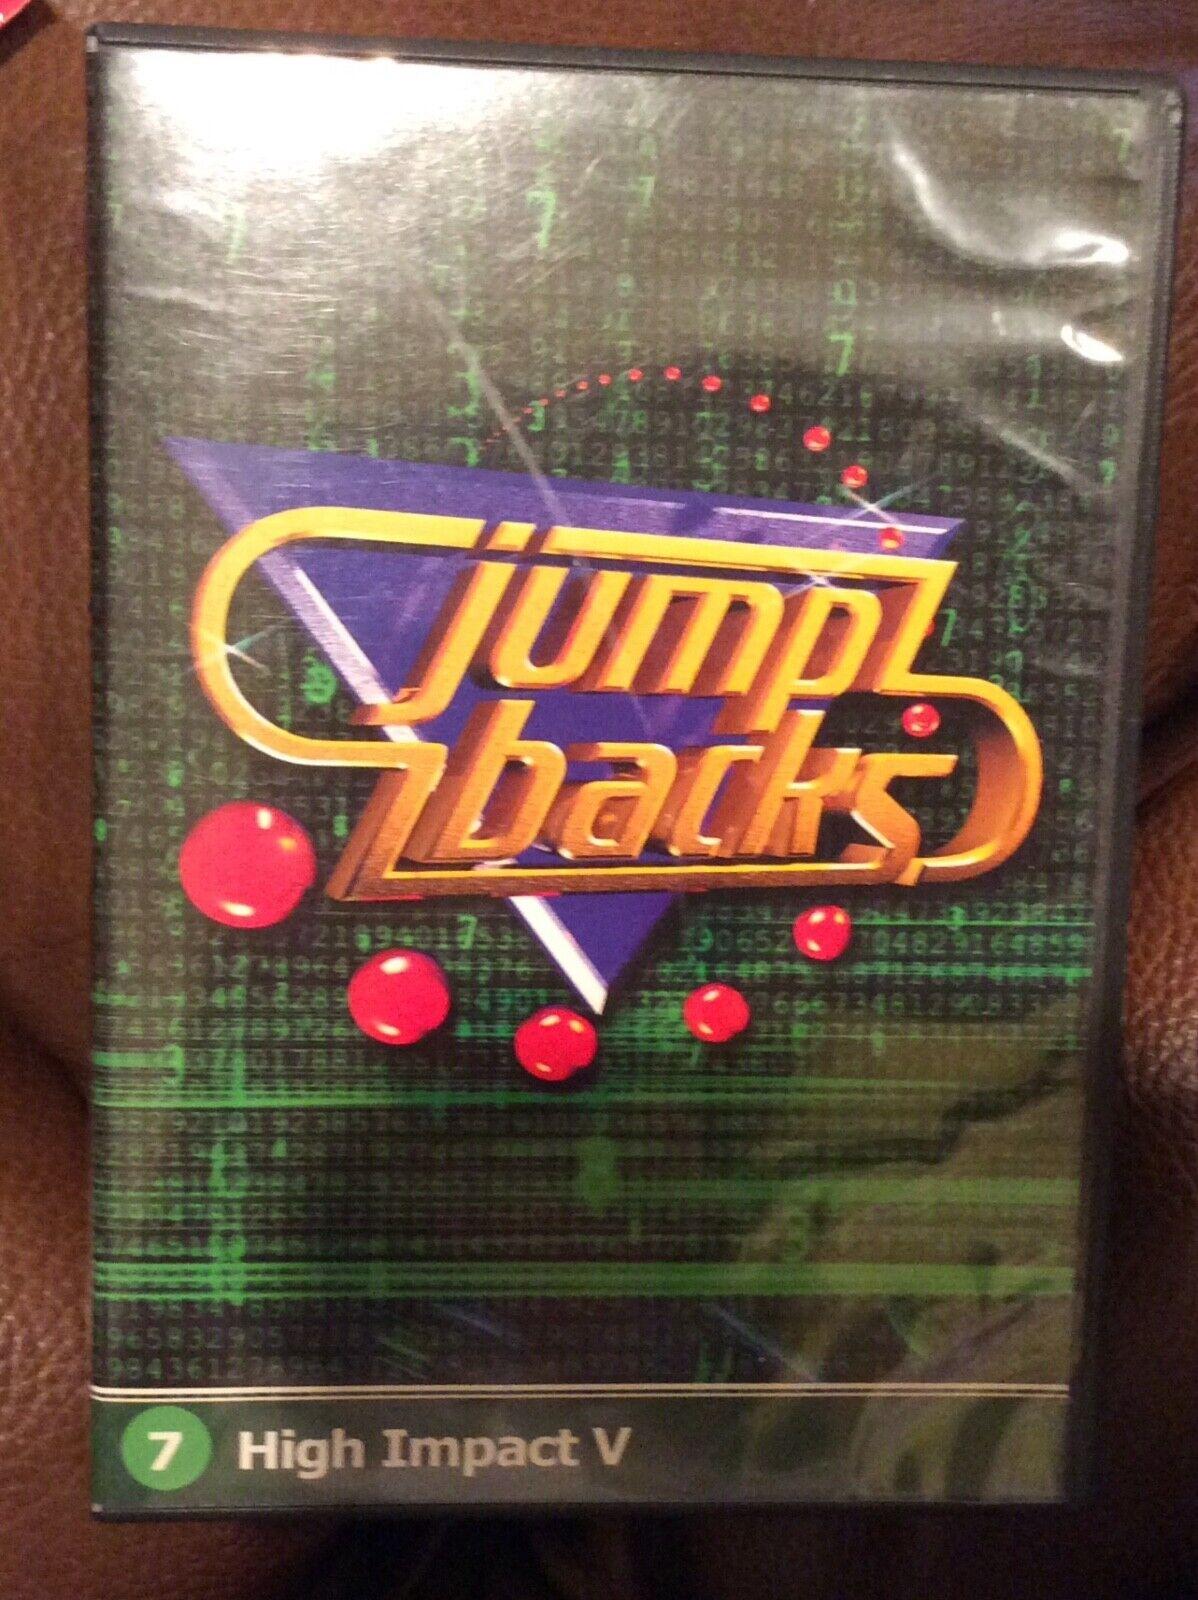 Digital Juice Jump Backs High Impact V 2 Disc DVD 7  - $5.95